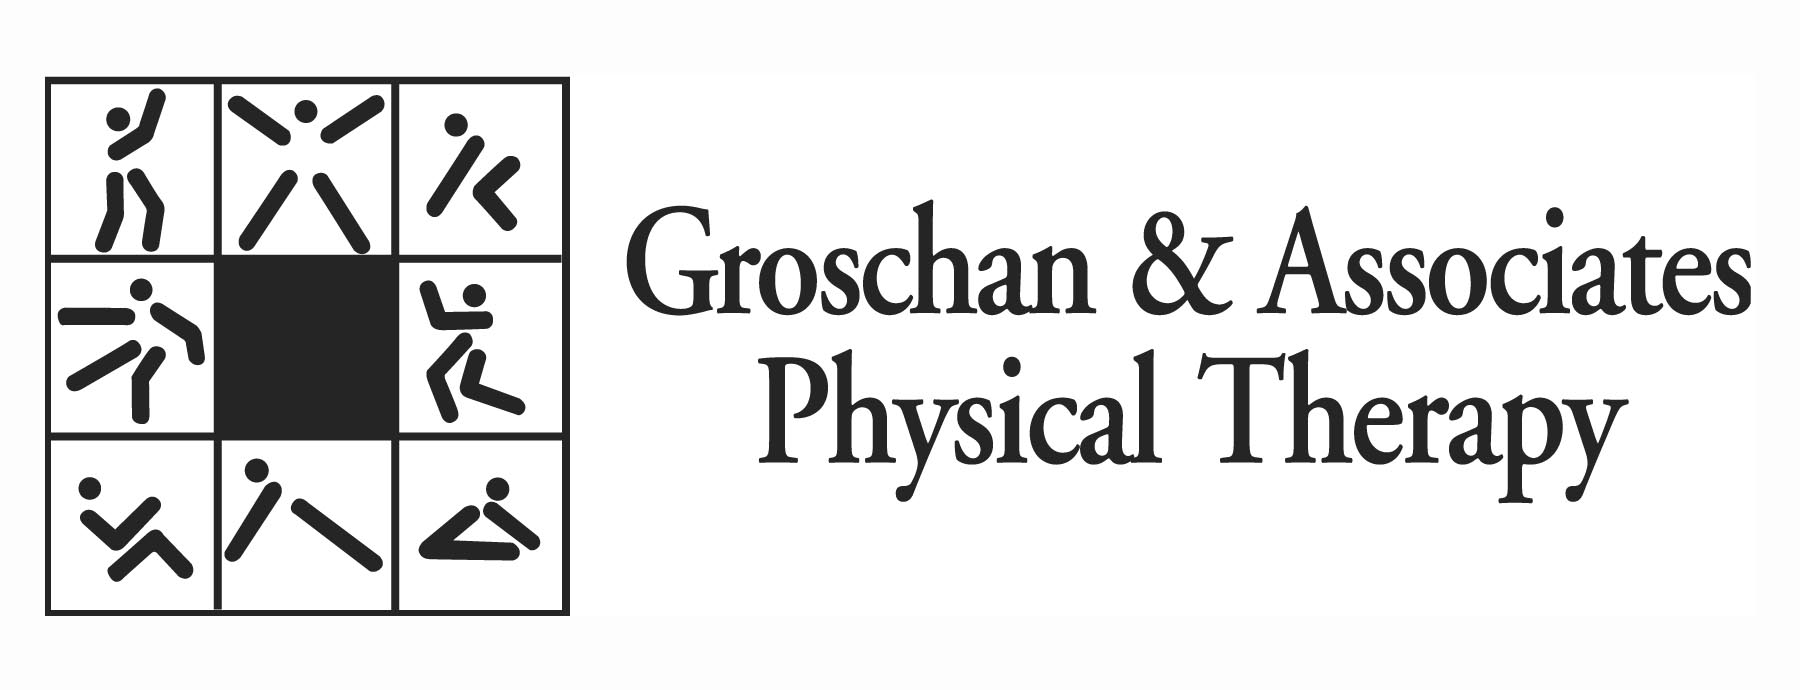 Groschan_logo_2015.jpg